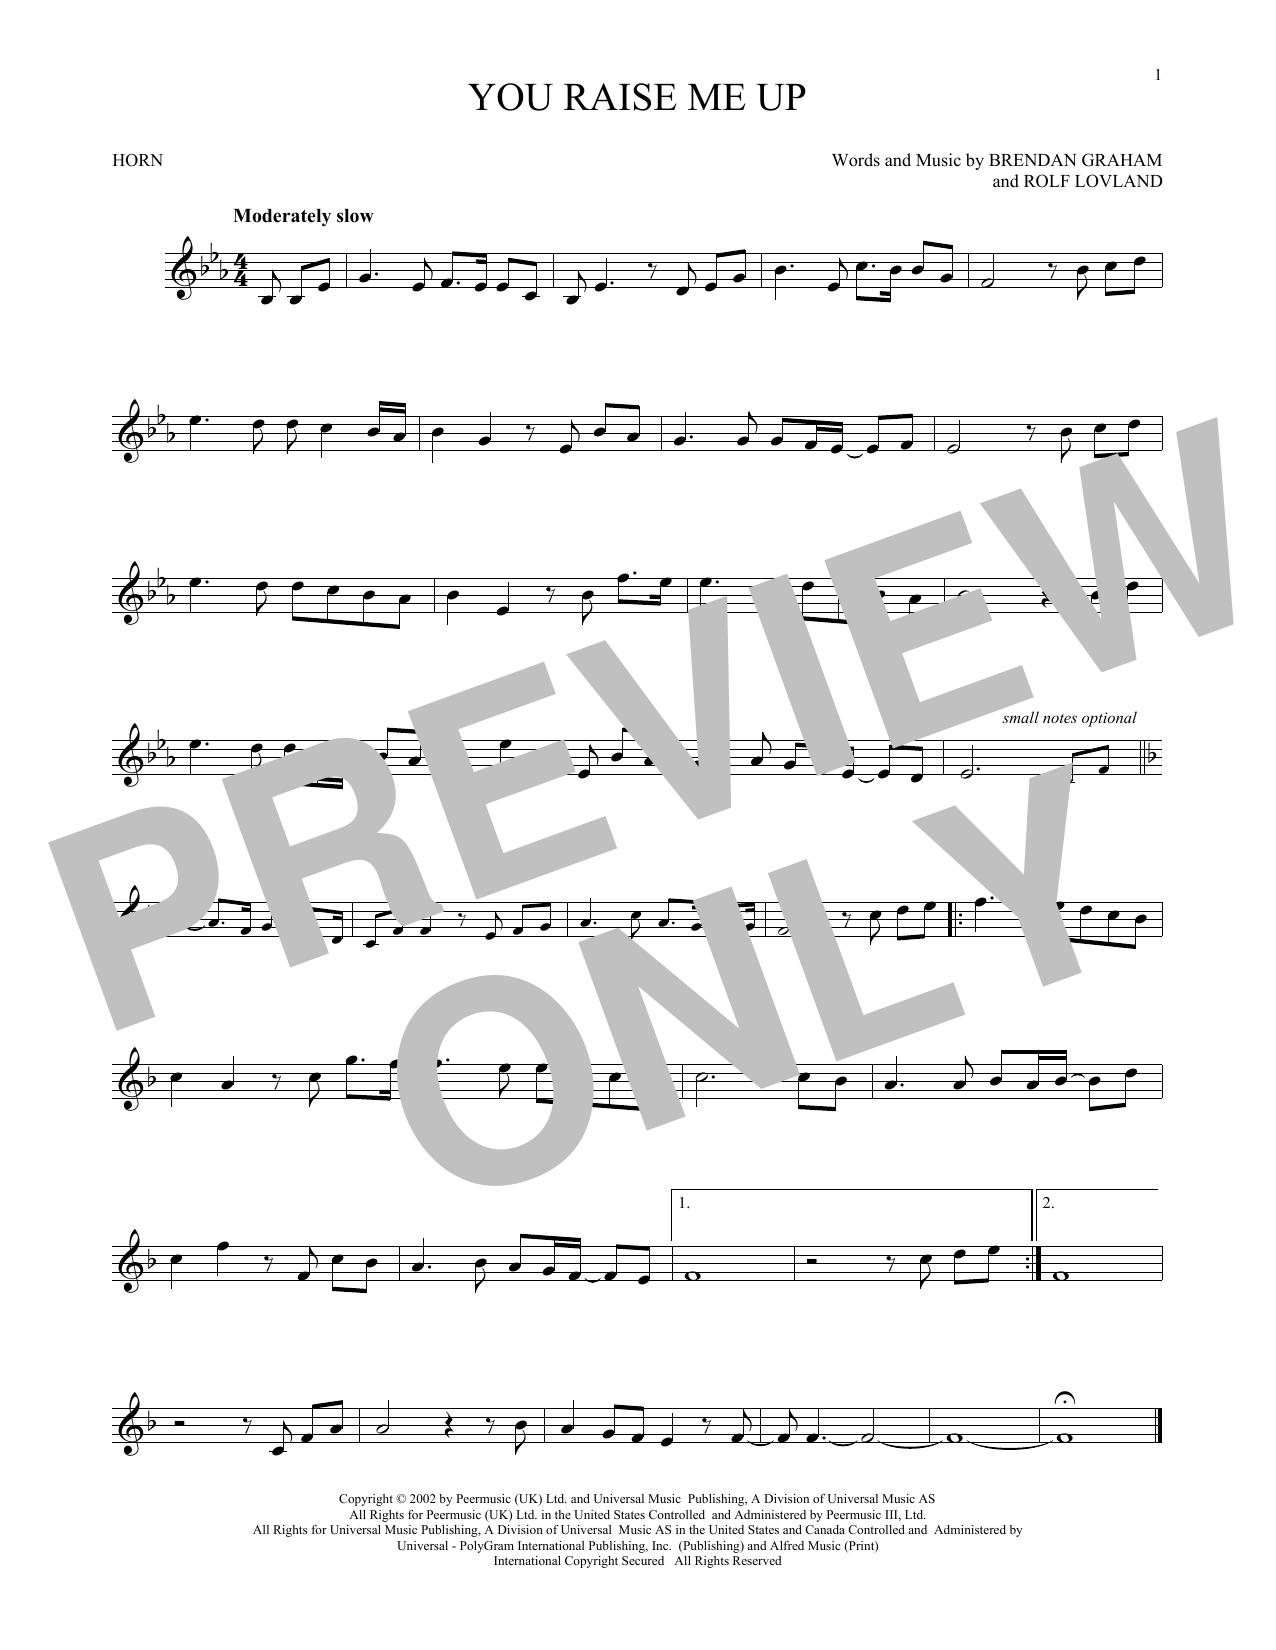 Brendan Graham 'You Raise Me Up' Sheet Music Notes, Chords | Download  Printable Trombone - SKU: 169508